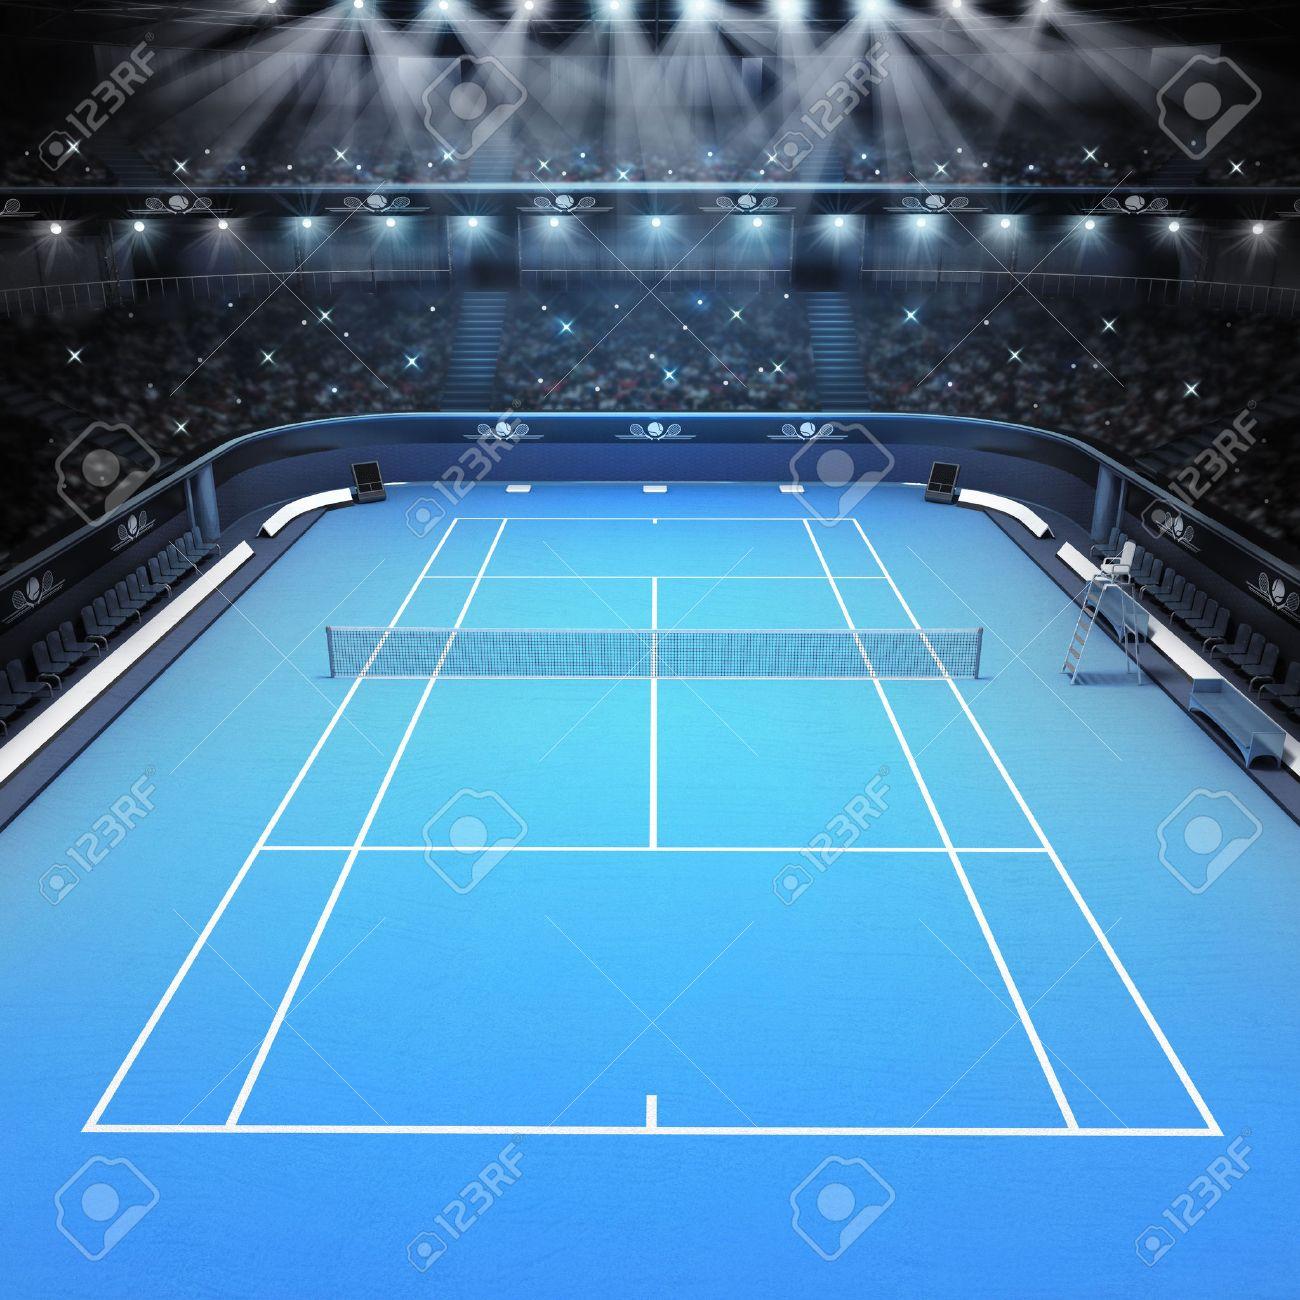 blue hard surface tennis court and stadium full of spectators with spotlights tennis sport theme render illustration background - 40869192